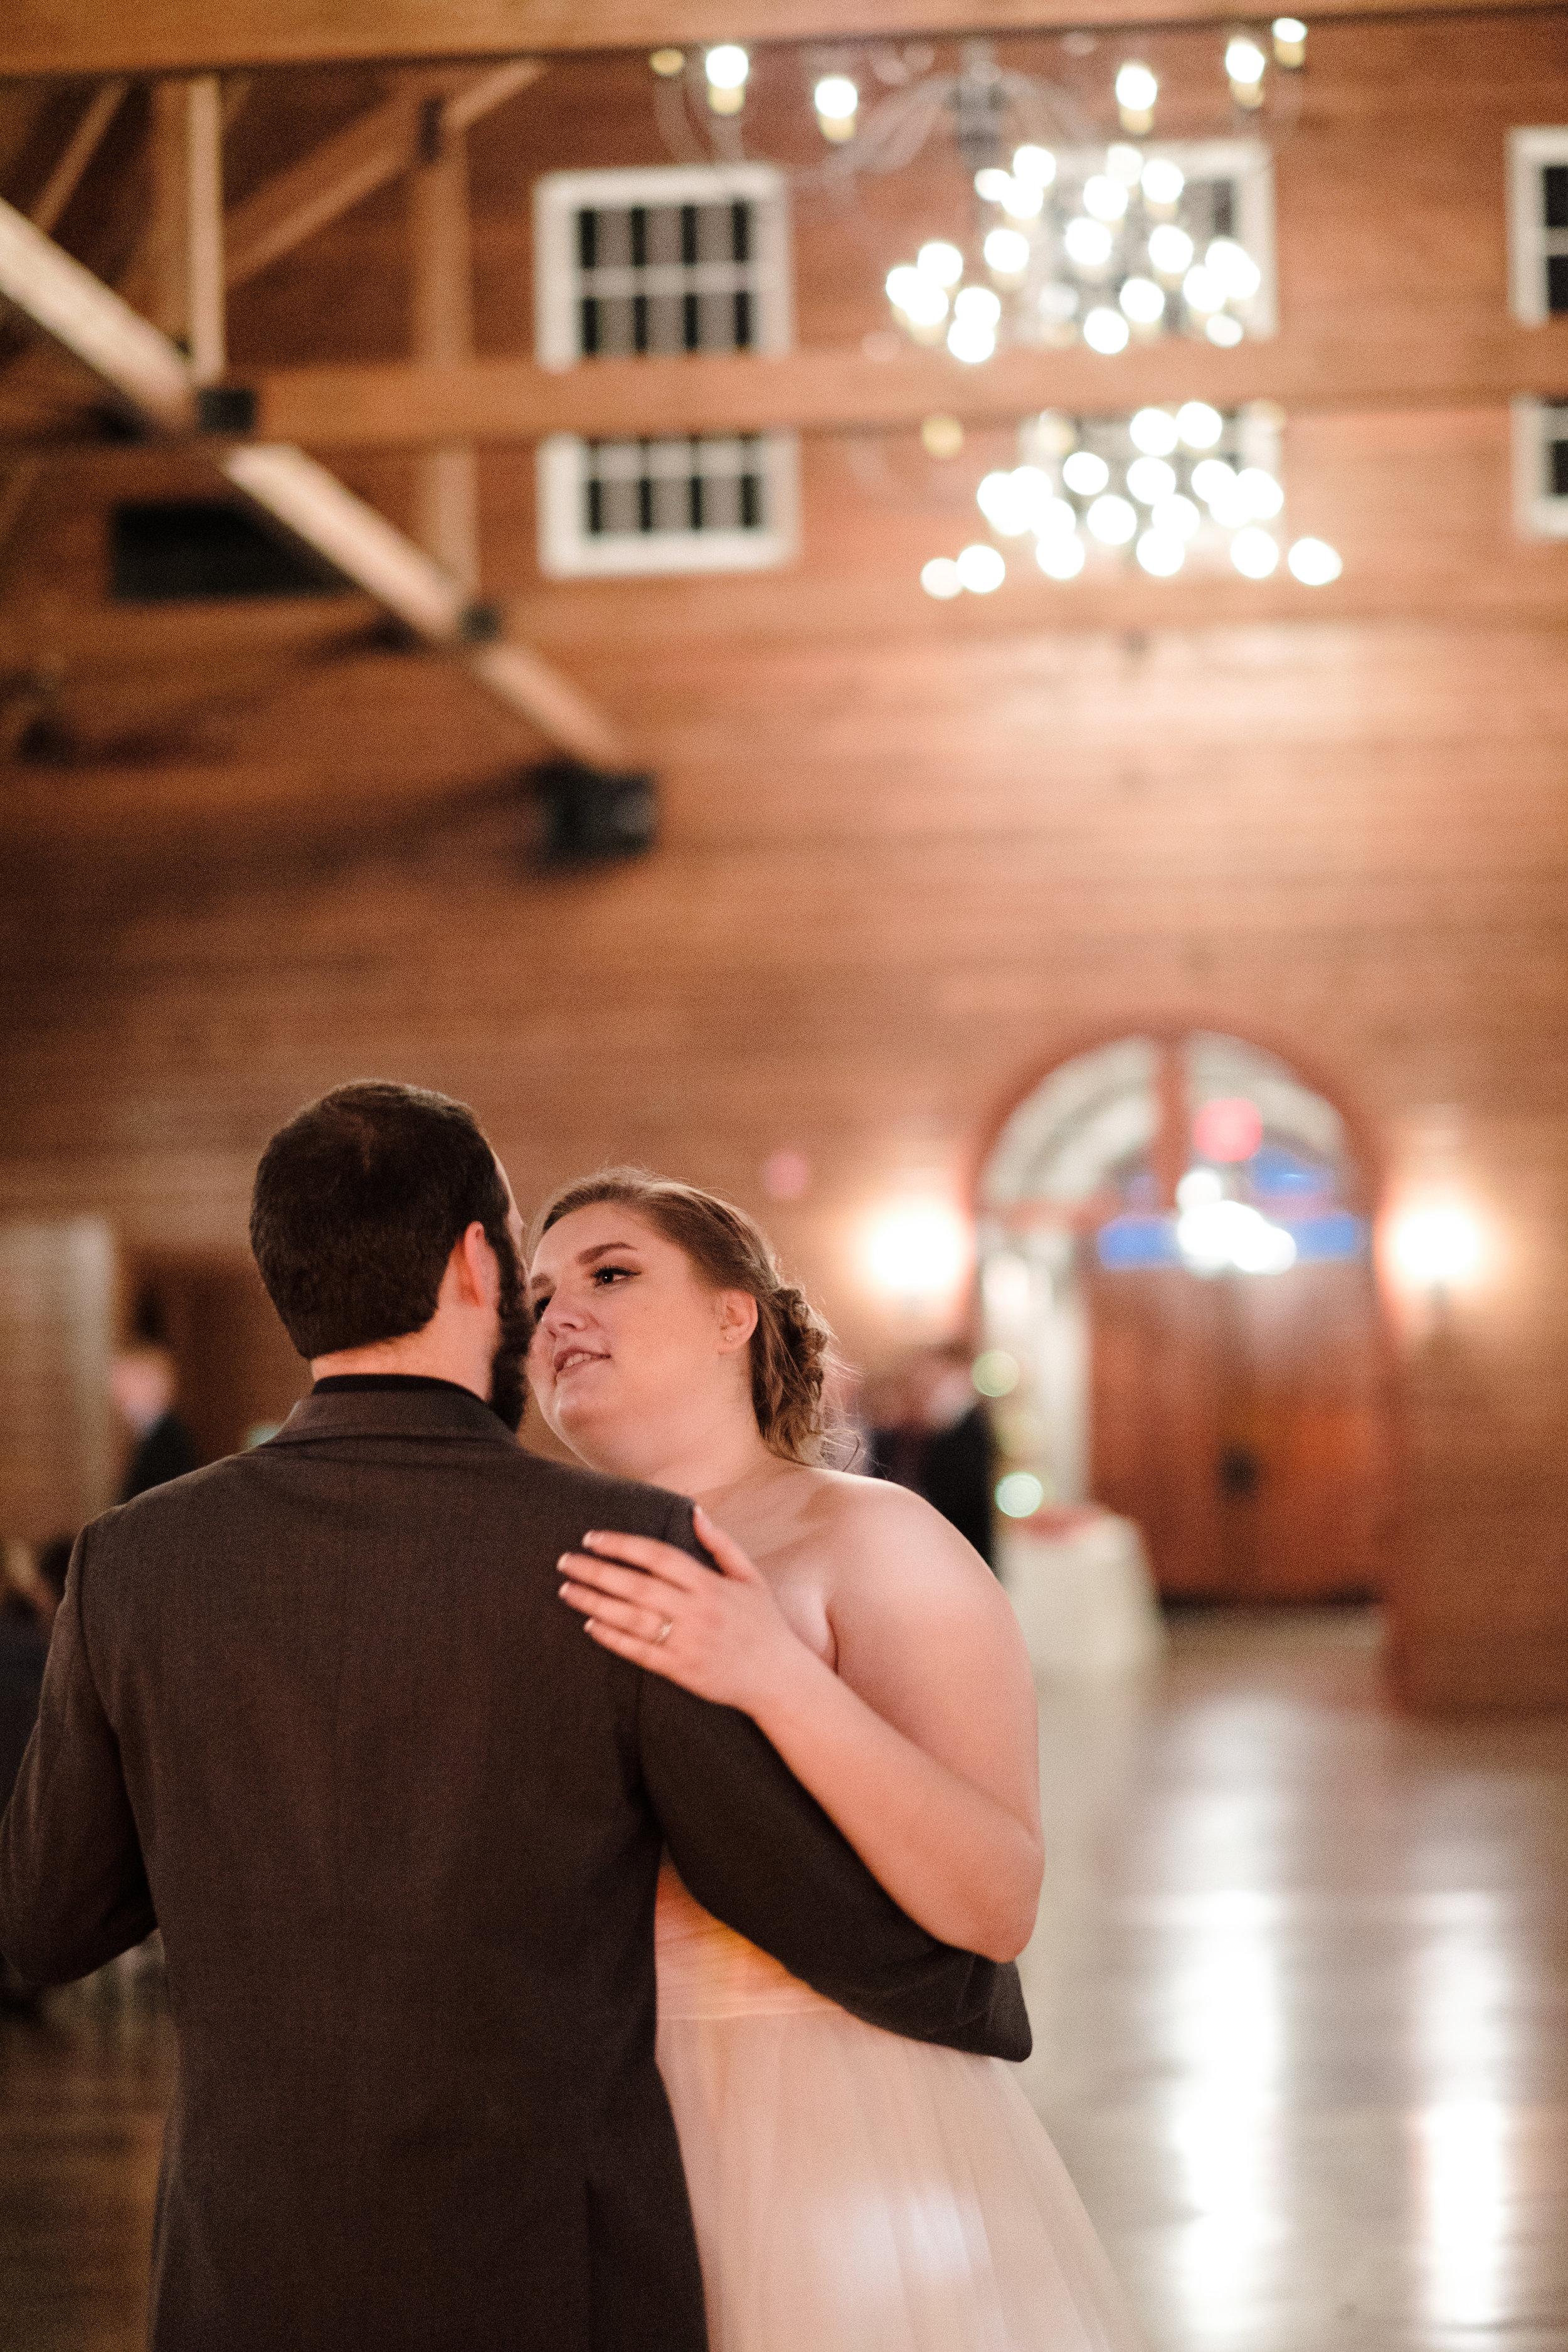 18-12-28 Corinne-Henry-Pavilion-Wedding-536.jpg